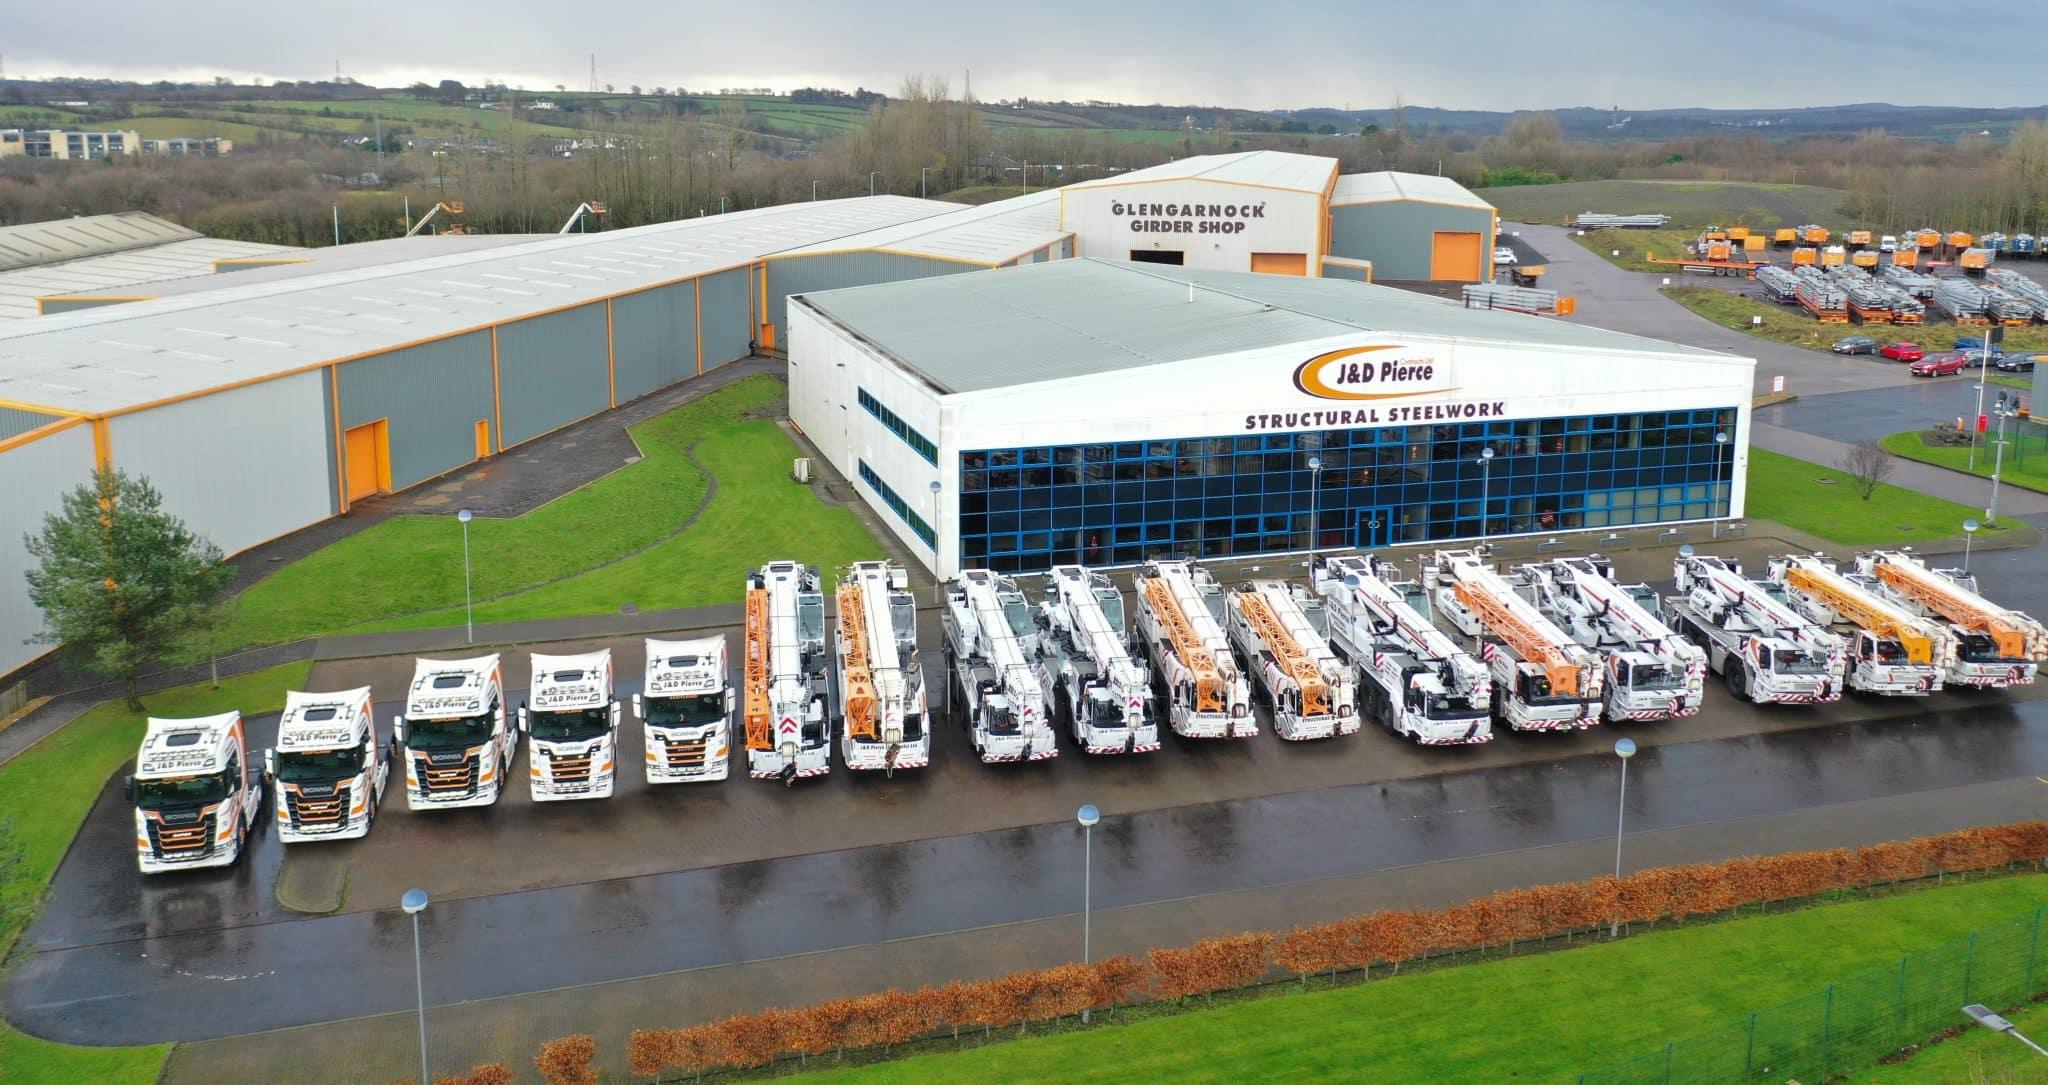 JD Pierce lorry and crane fleet